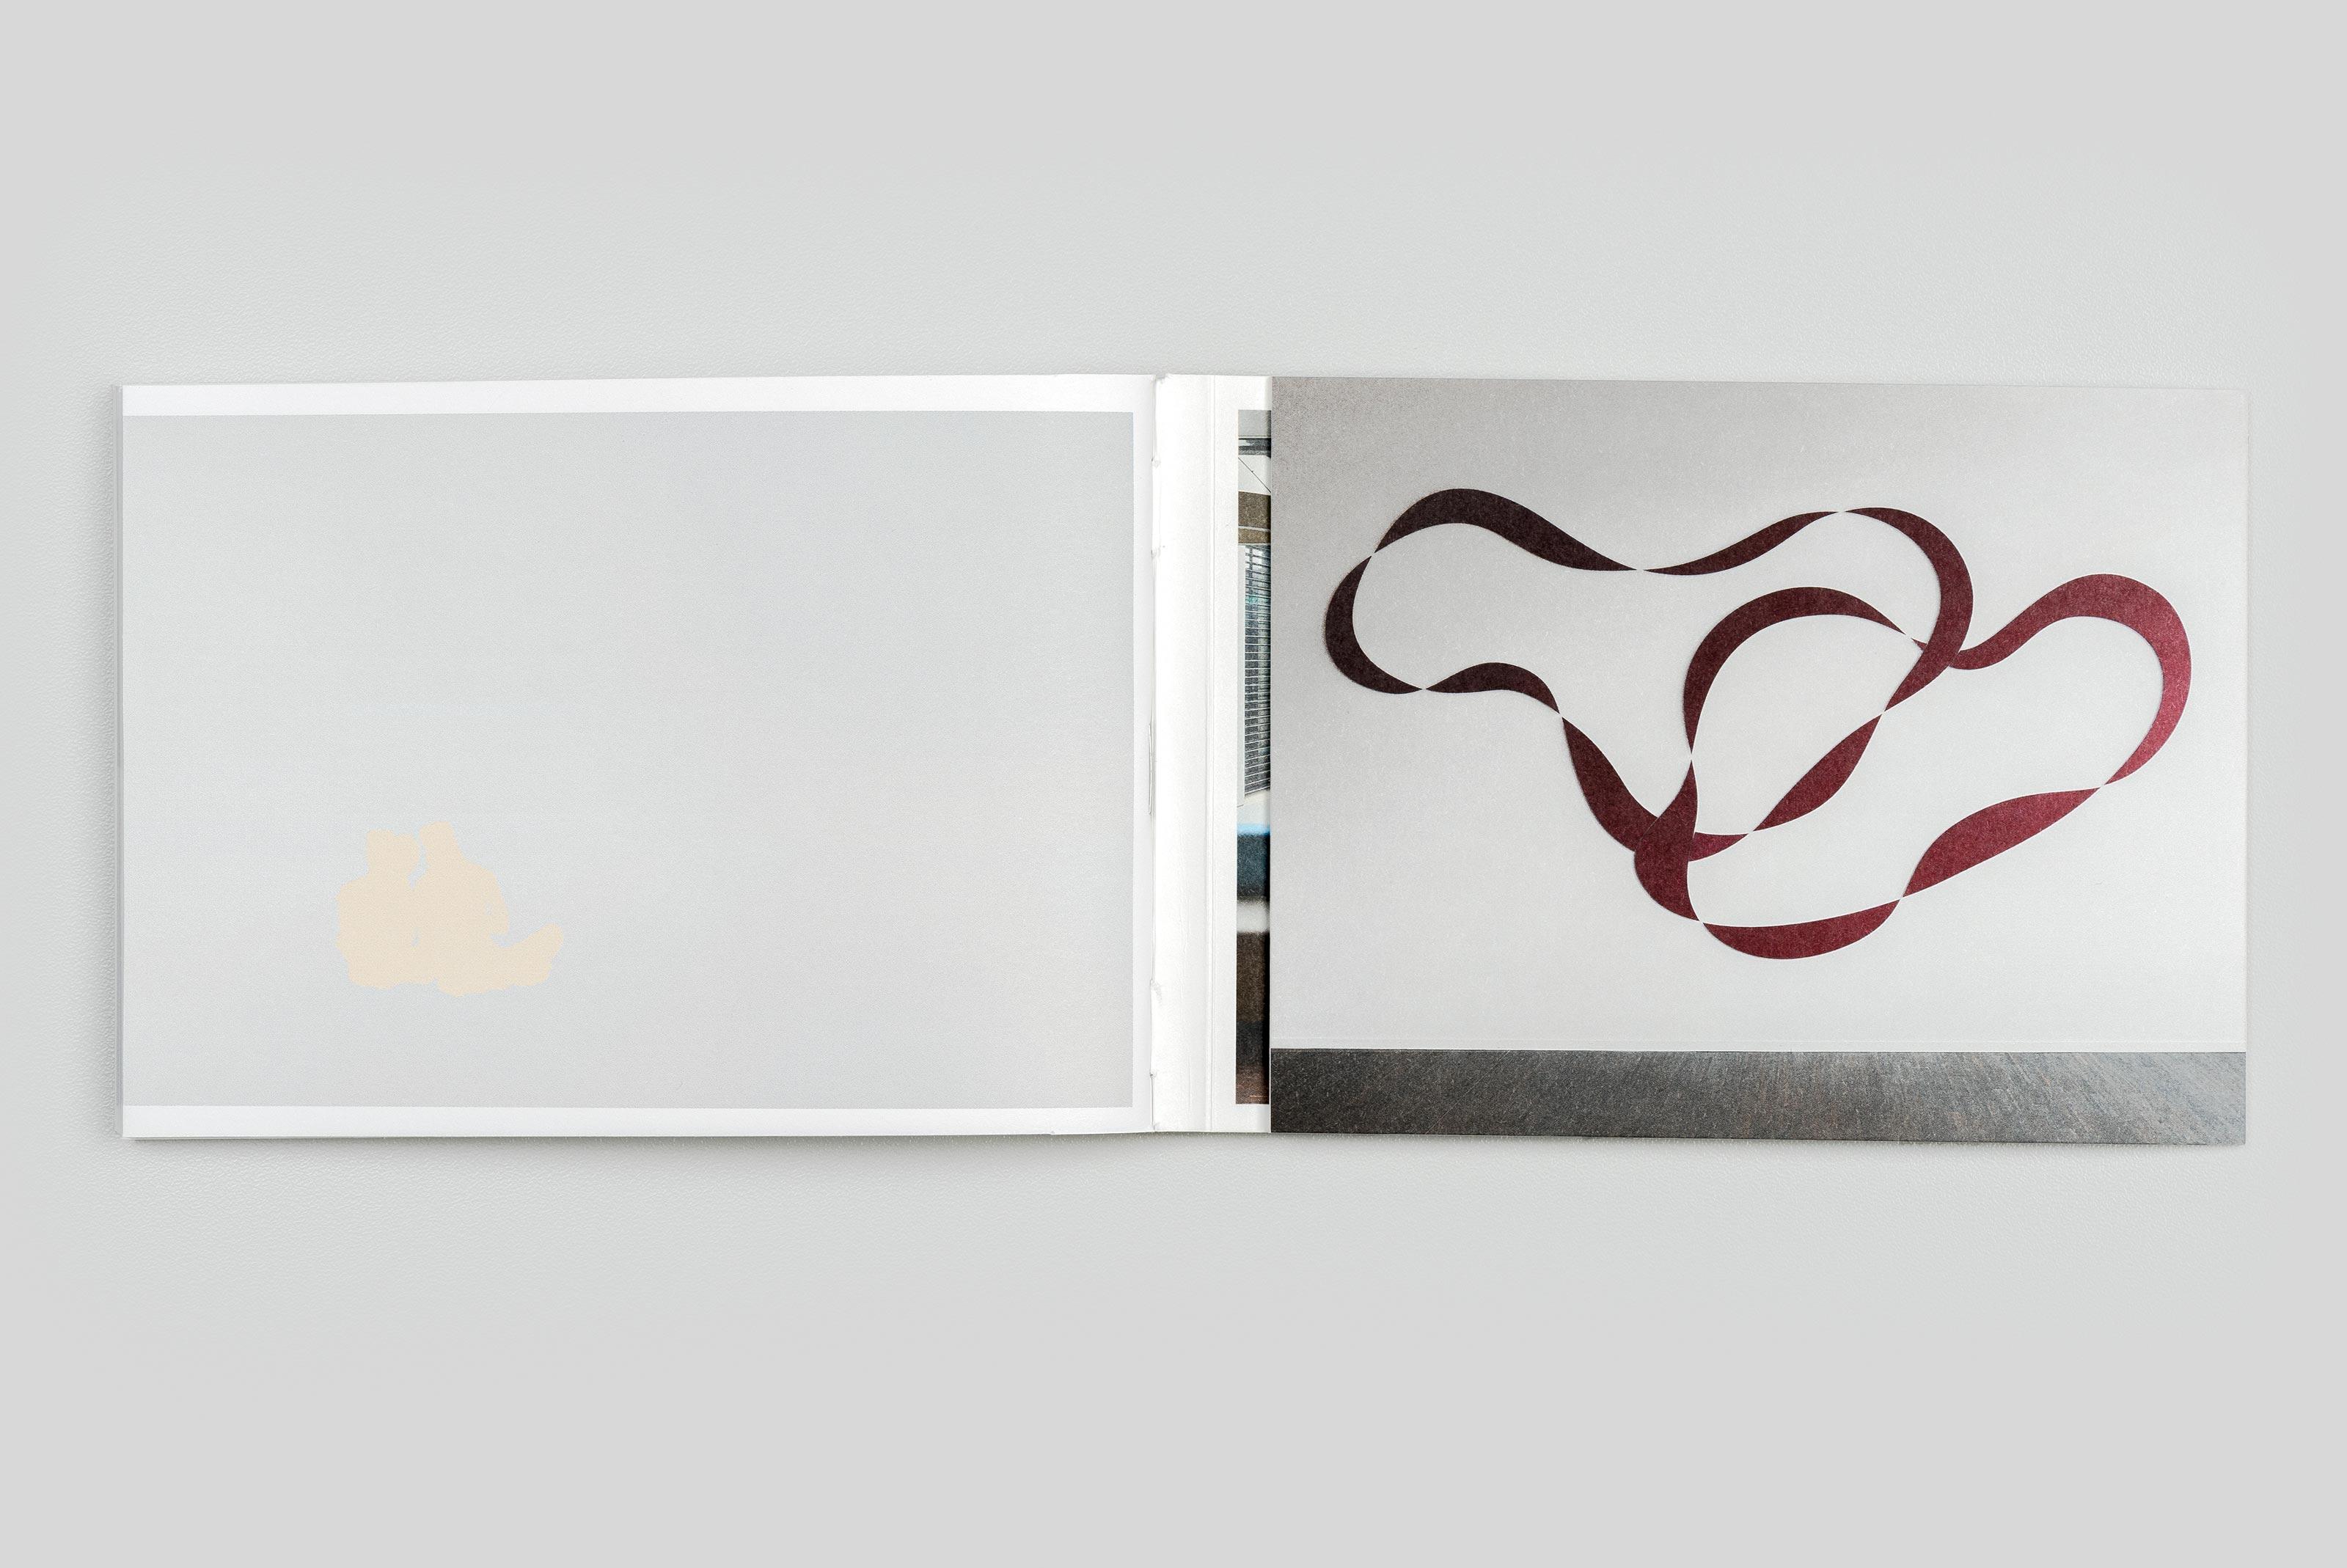 Kunstkommission der Schweizerischen Post, Christian Grogg – Point de Vue, content art ©Atelier Pol × Barbara Hess